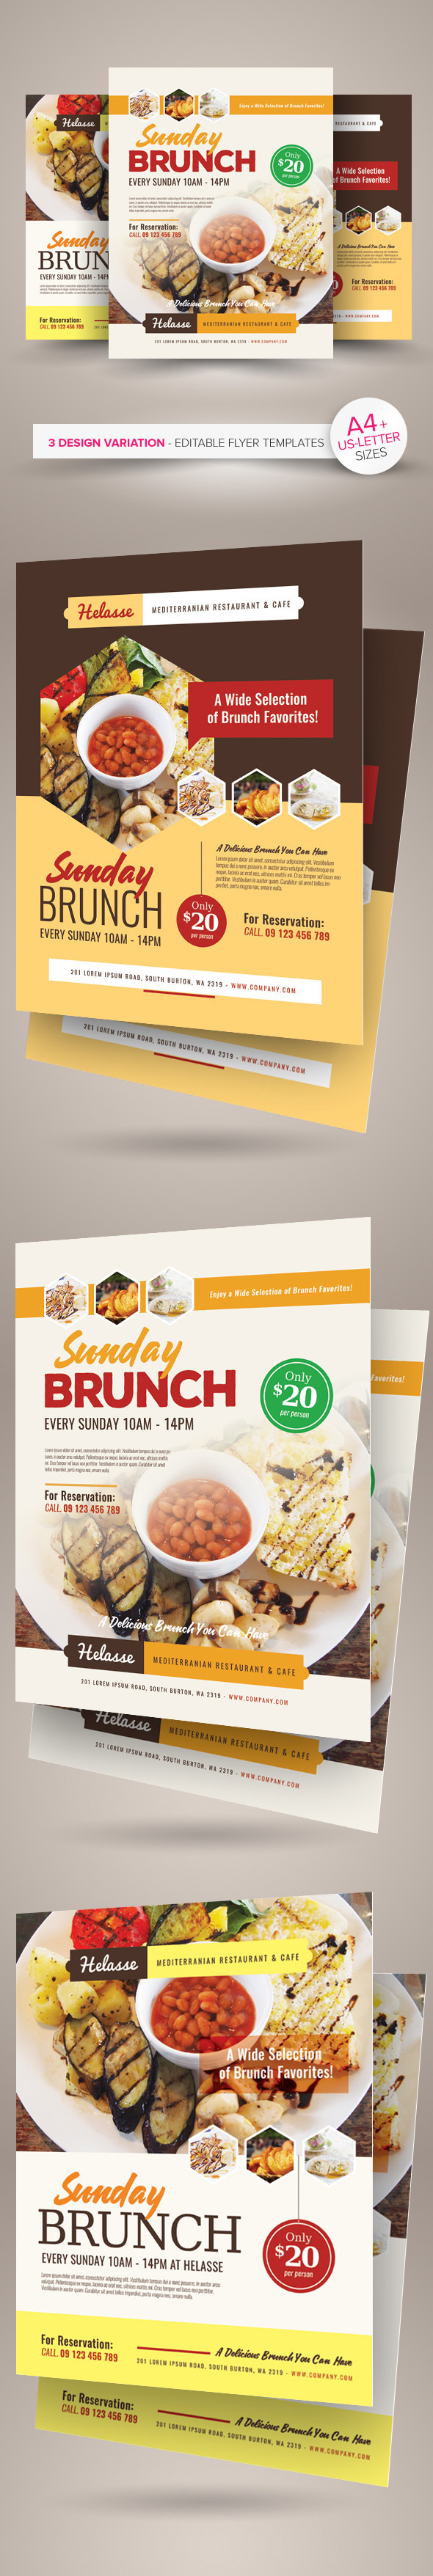 sunday brunch flyer templates on behance